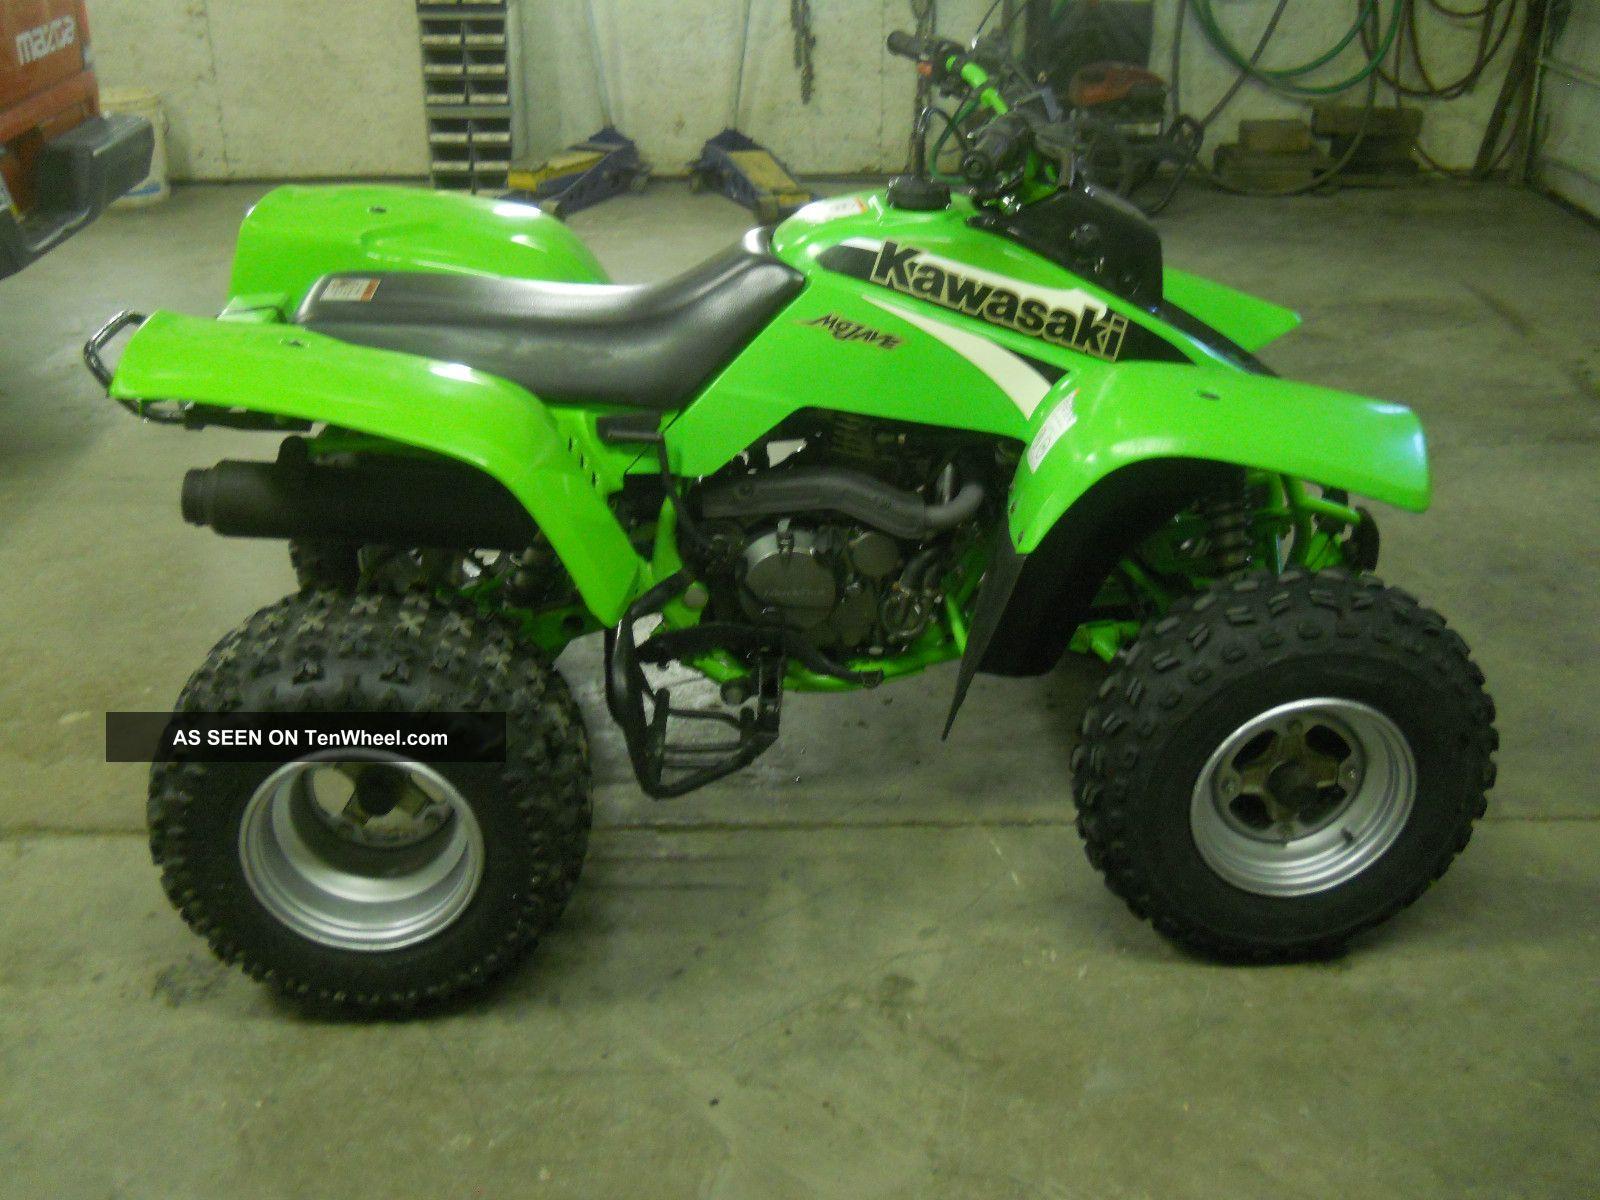 Kawasaki 250 Mojave Wiring Diagram 100 Free 400 Bayou Yamaha Blaster Engine Image For User Atv